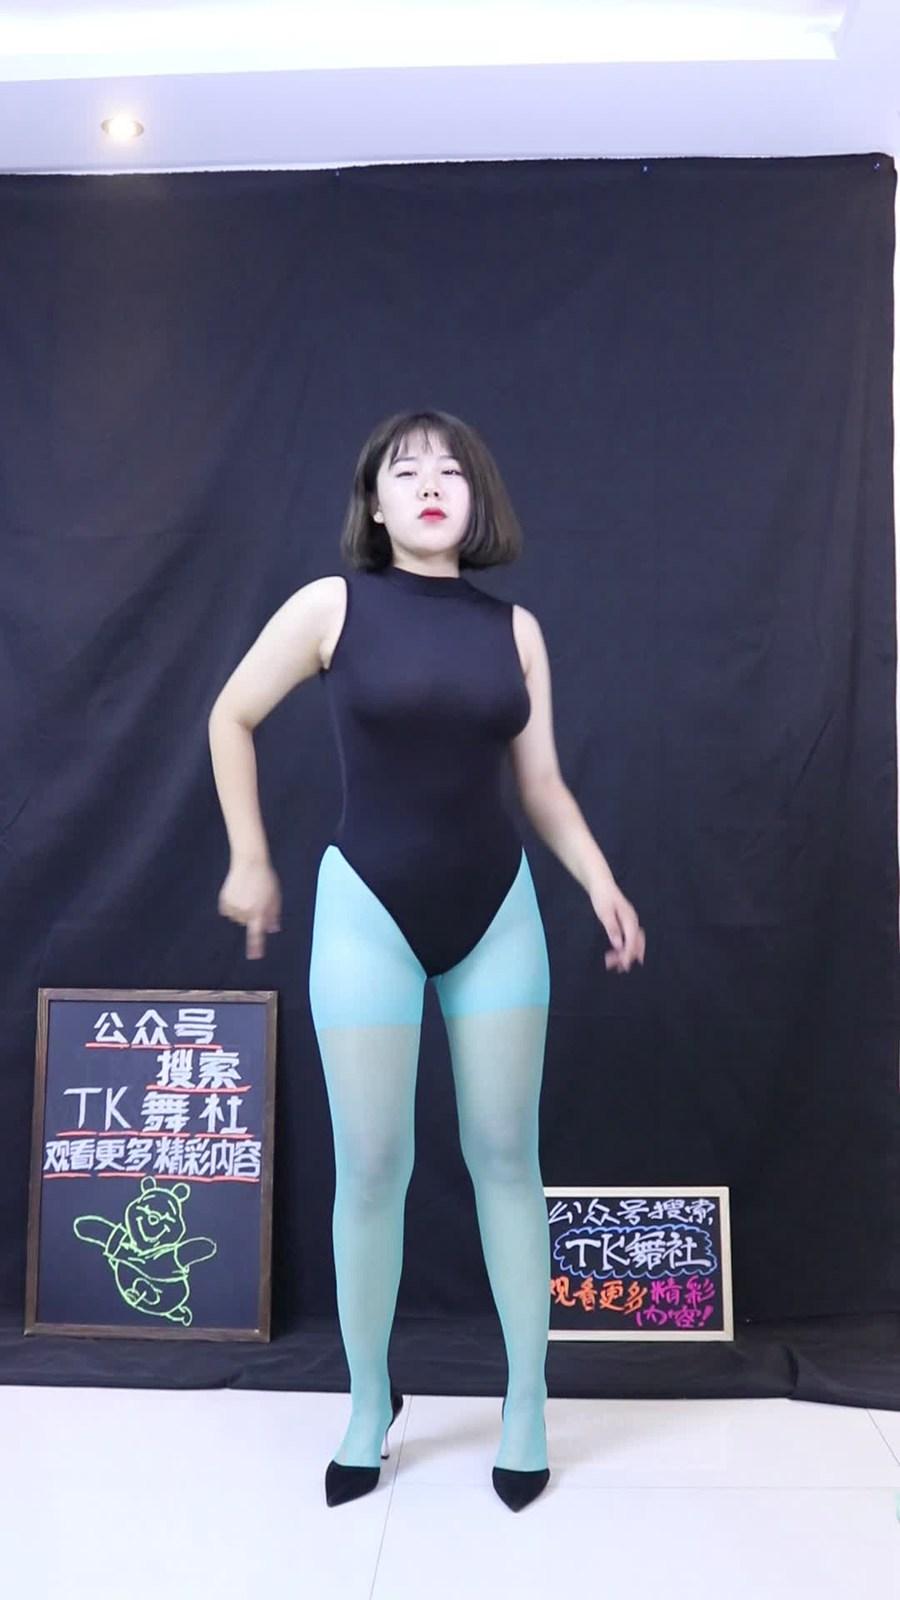 TK舞社 TK舞社 (88)